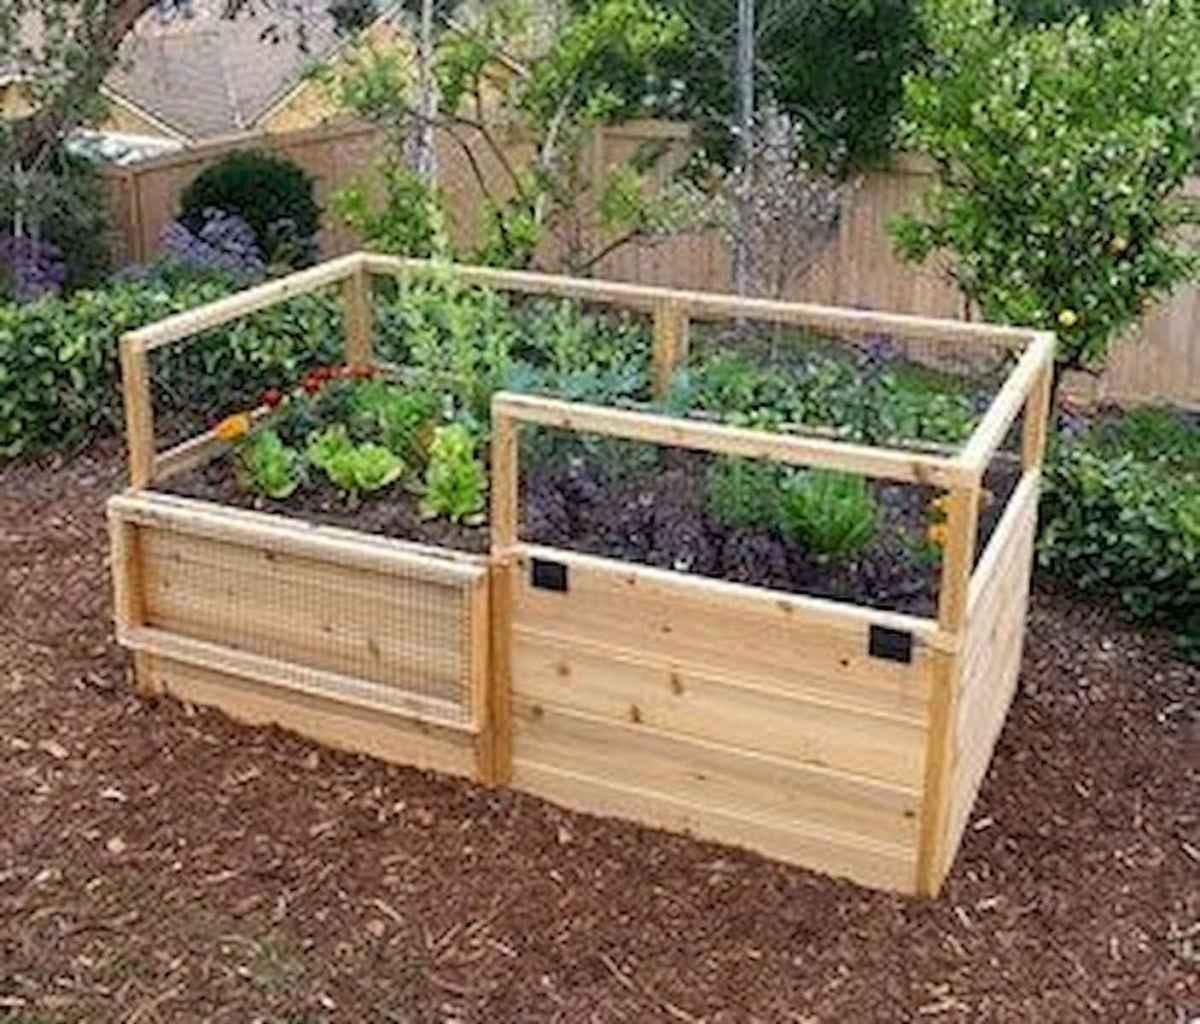 55 Favorite Garden Boxes Raised Design Ideas (55)